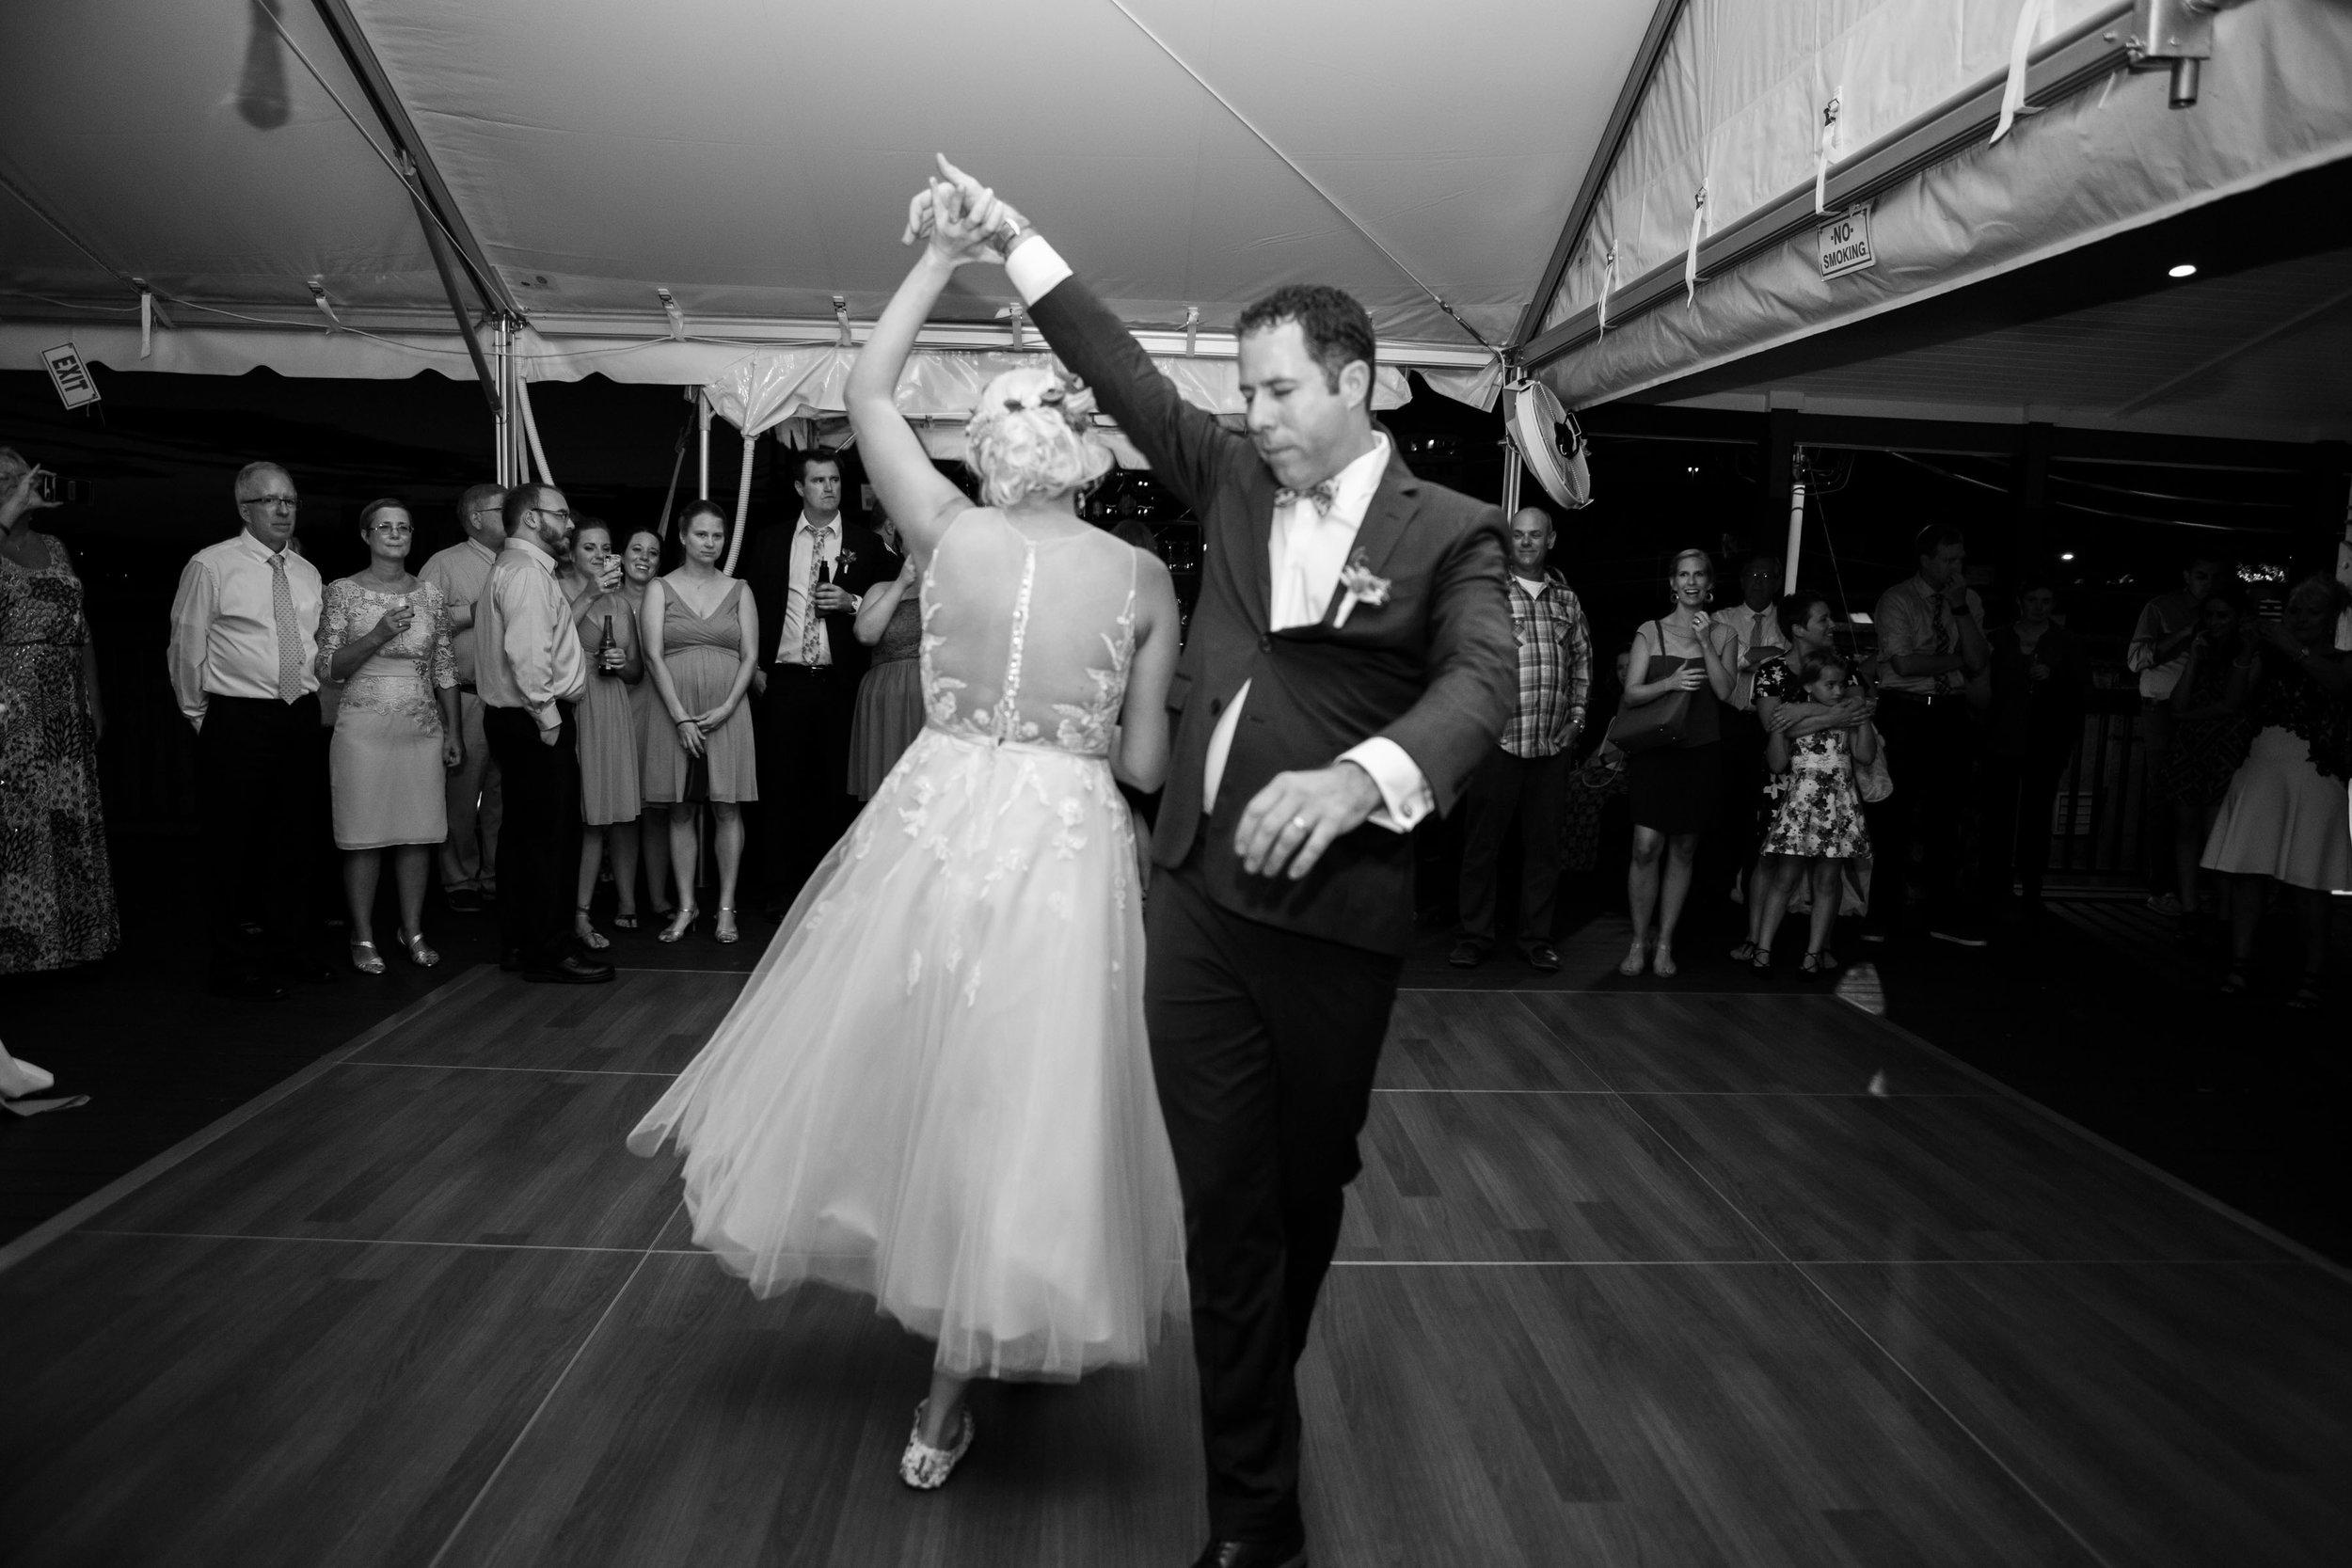 128-South-Wedding-Wilmington-NC-Photographer-Reception-134.jpg